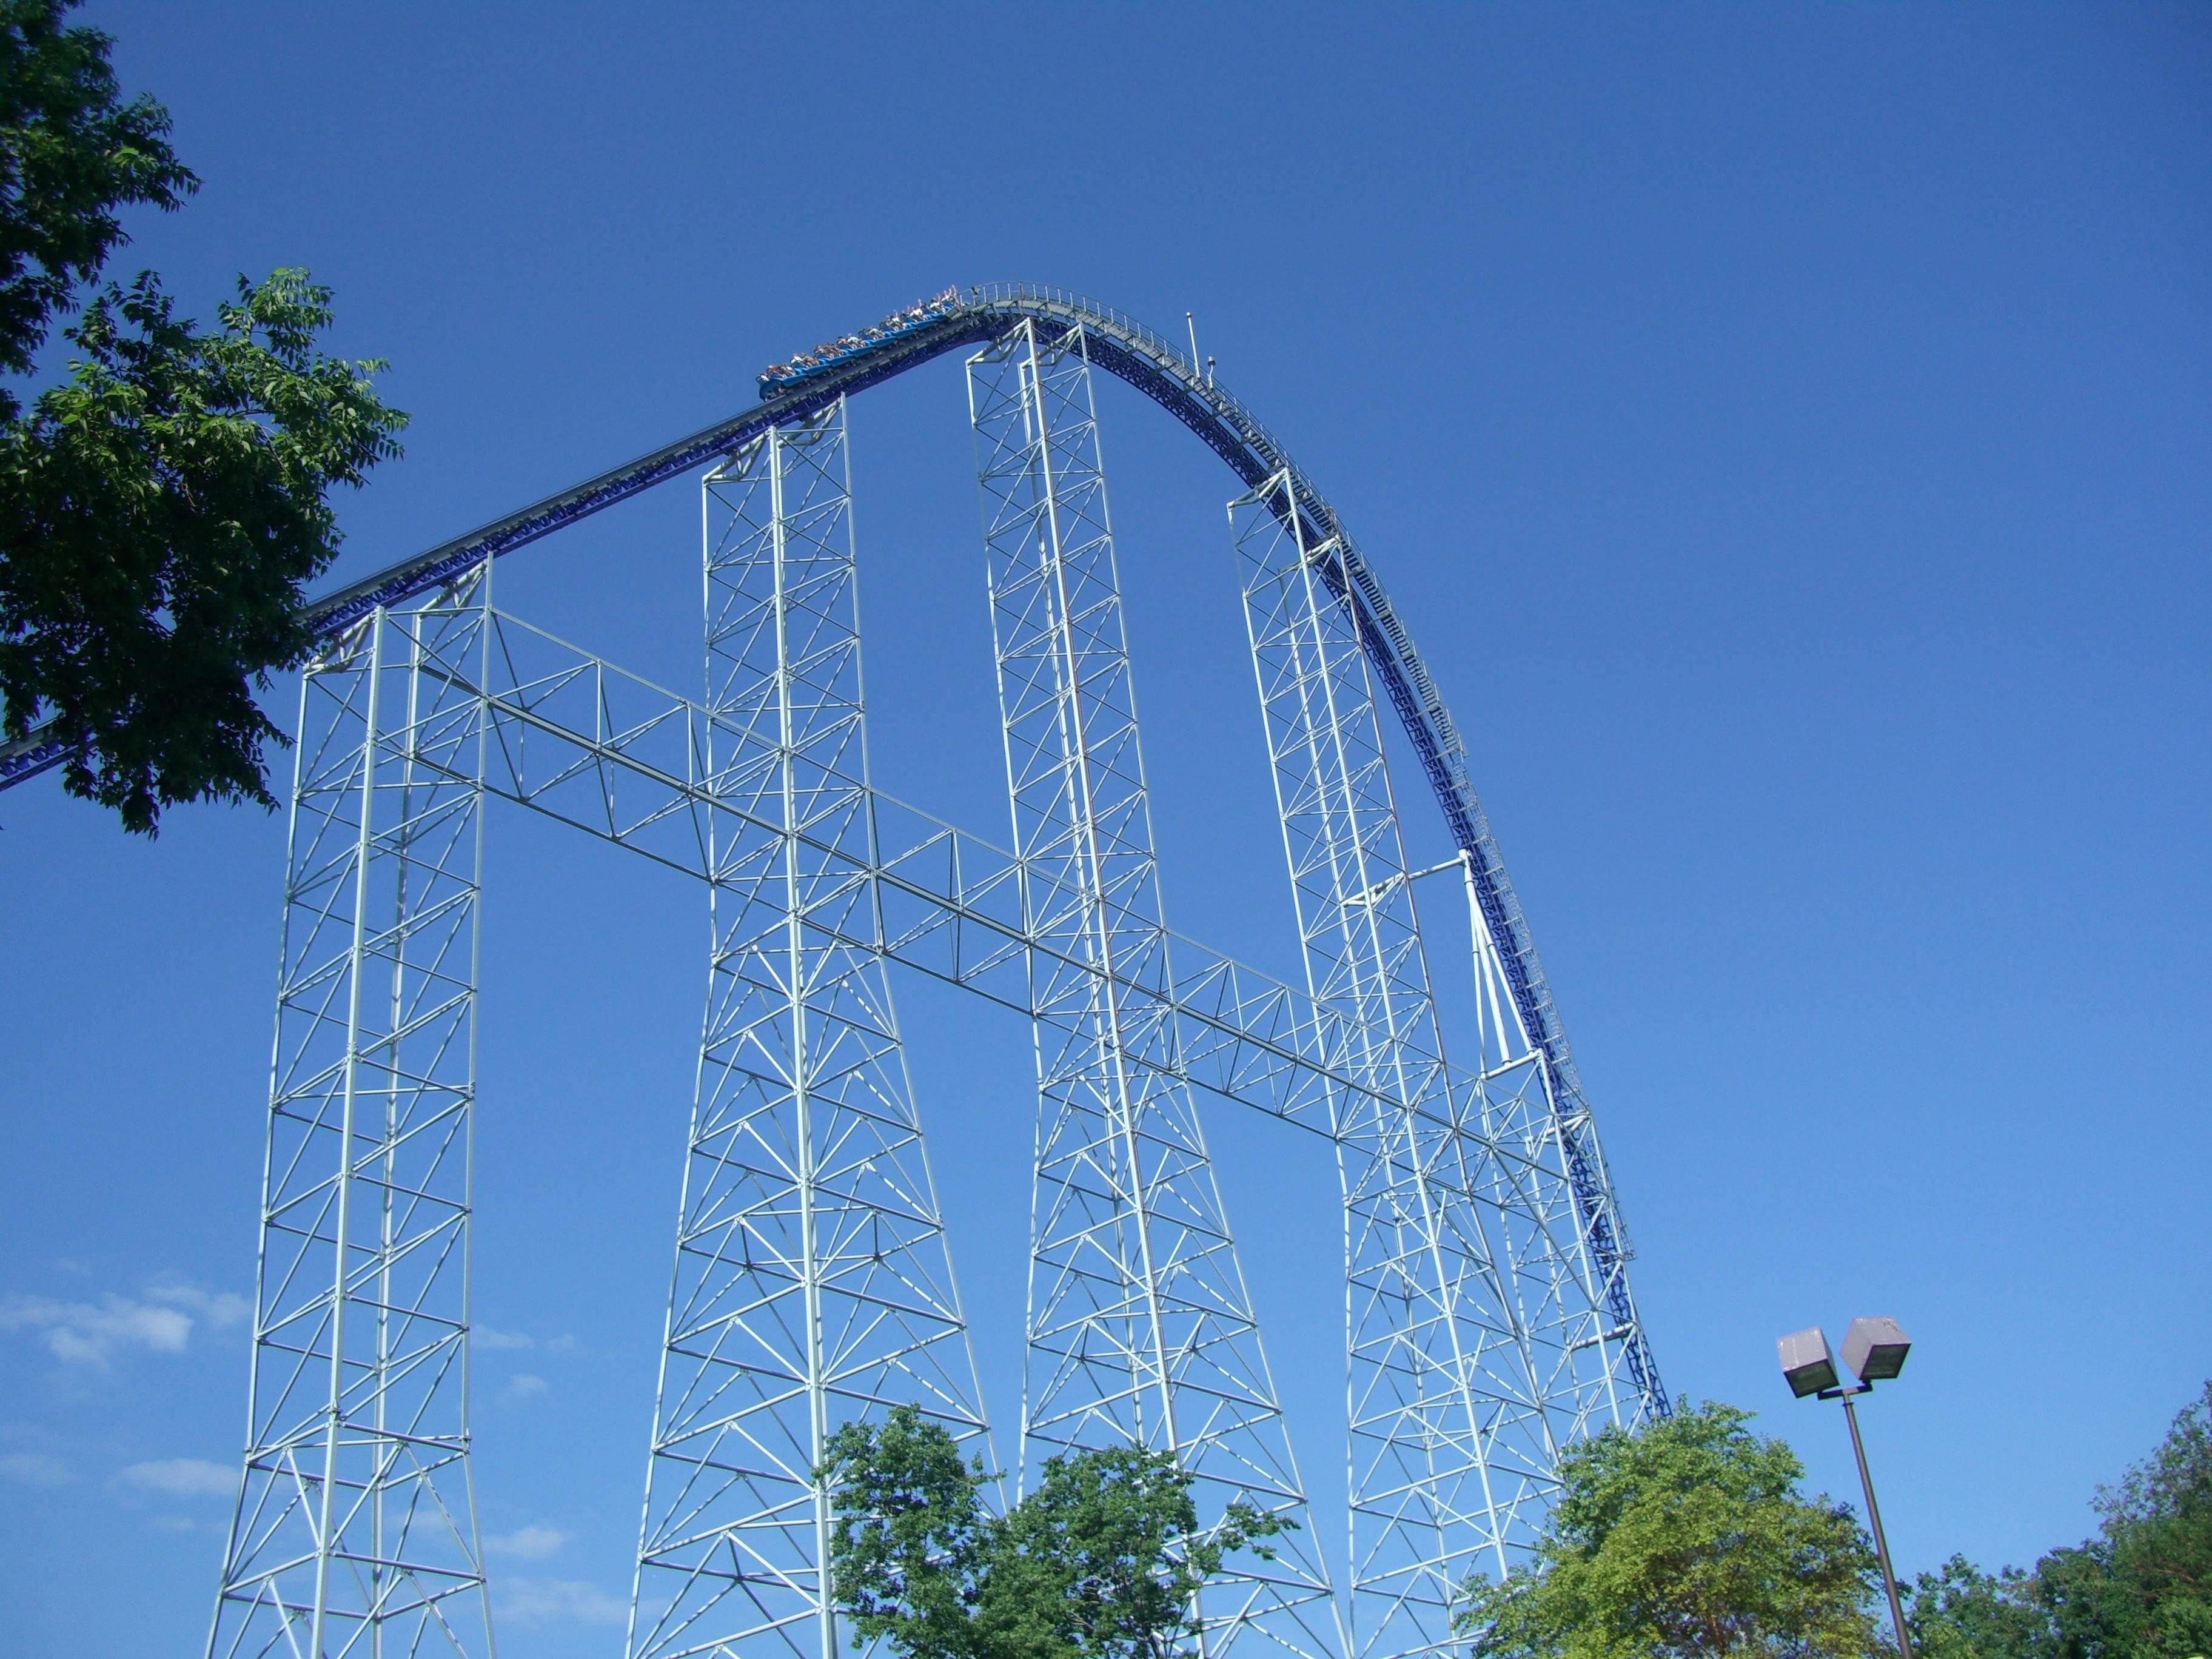 Random Best Roller Coasters in the World